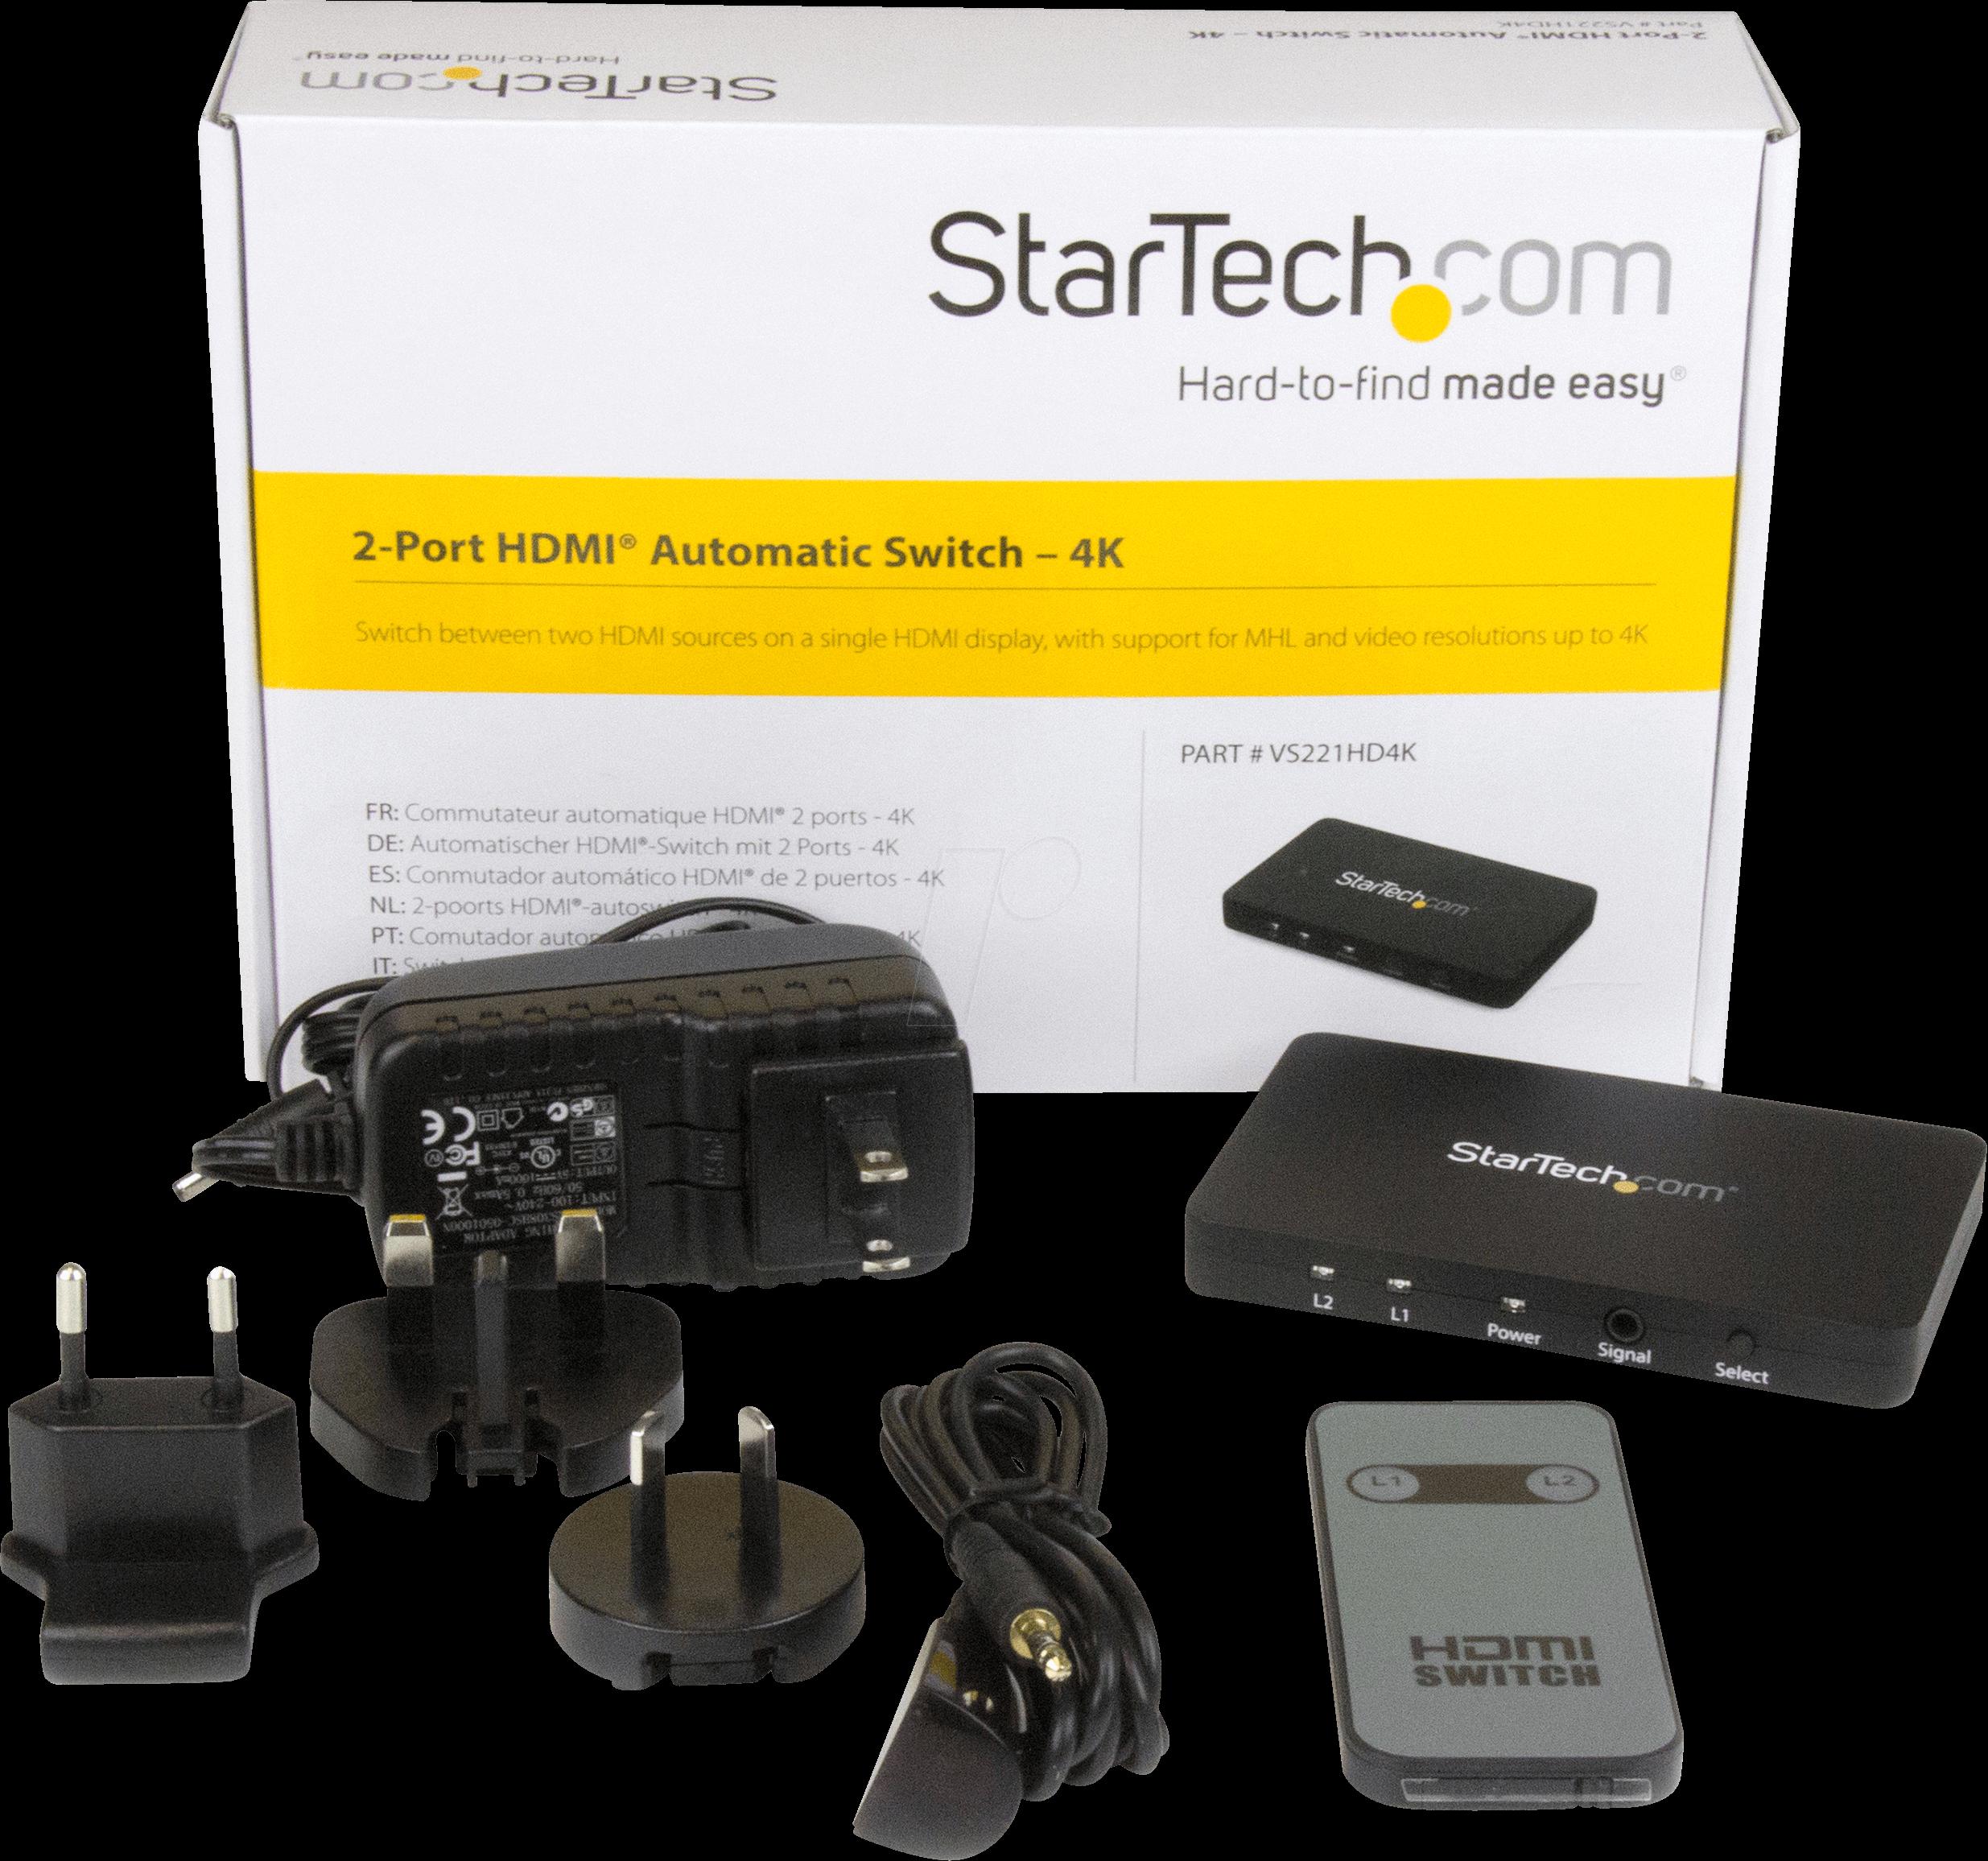 ST VS221HD4K - 2-Port HDMI automatic video switch - 4K